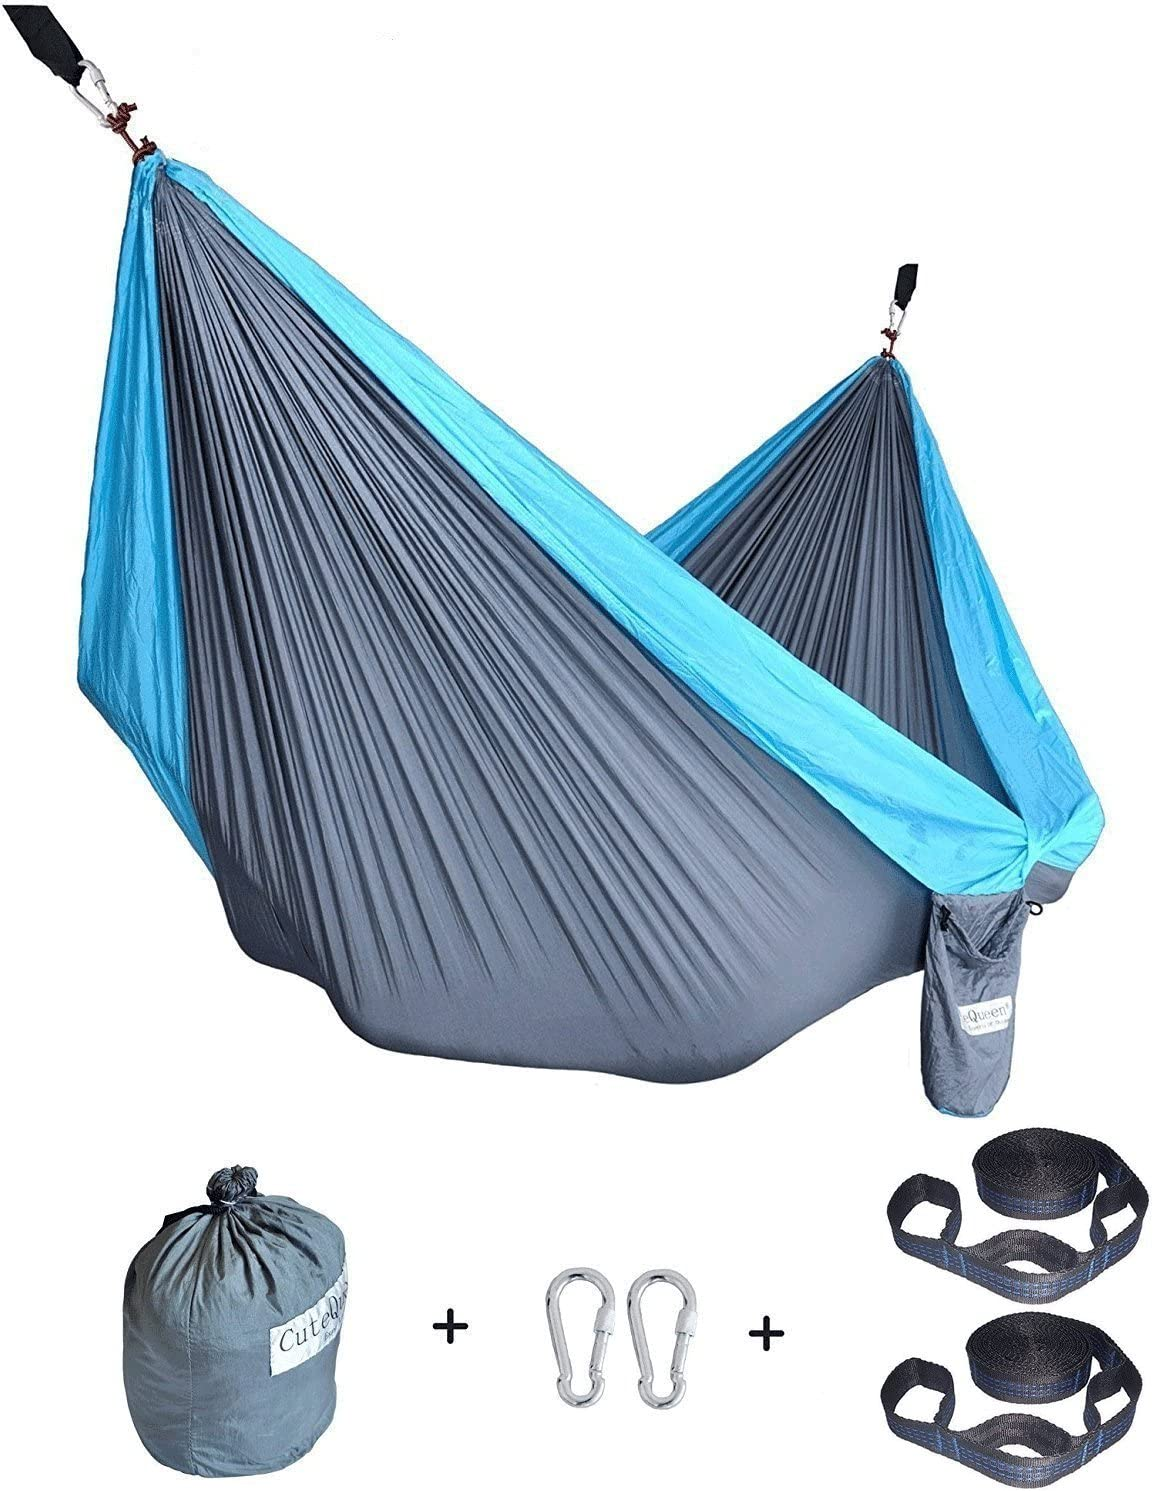 cutequeen     amazon    hammocks   hammocks stands  u0026 accessories  patio lawn      rh   amazon